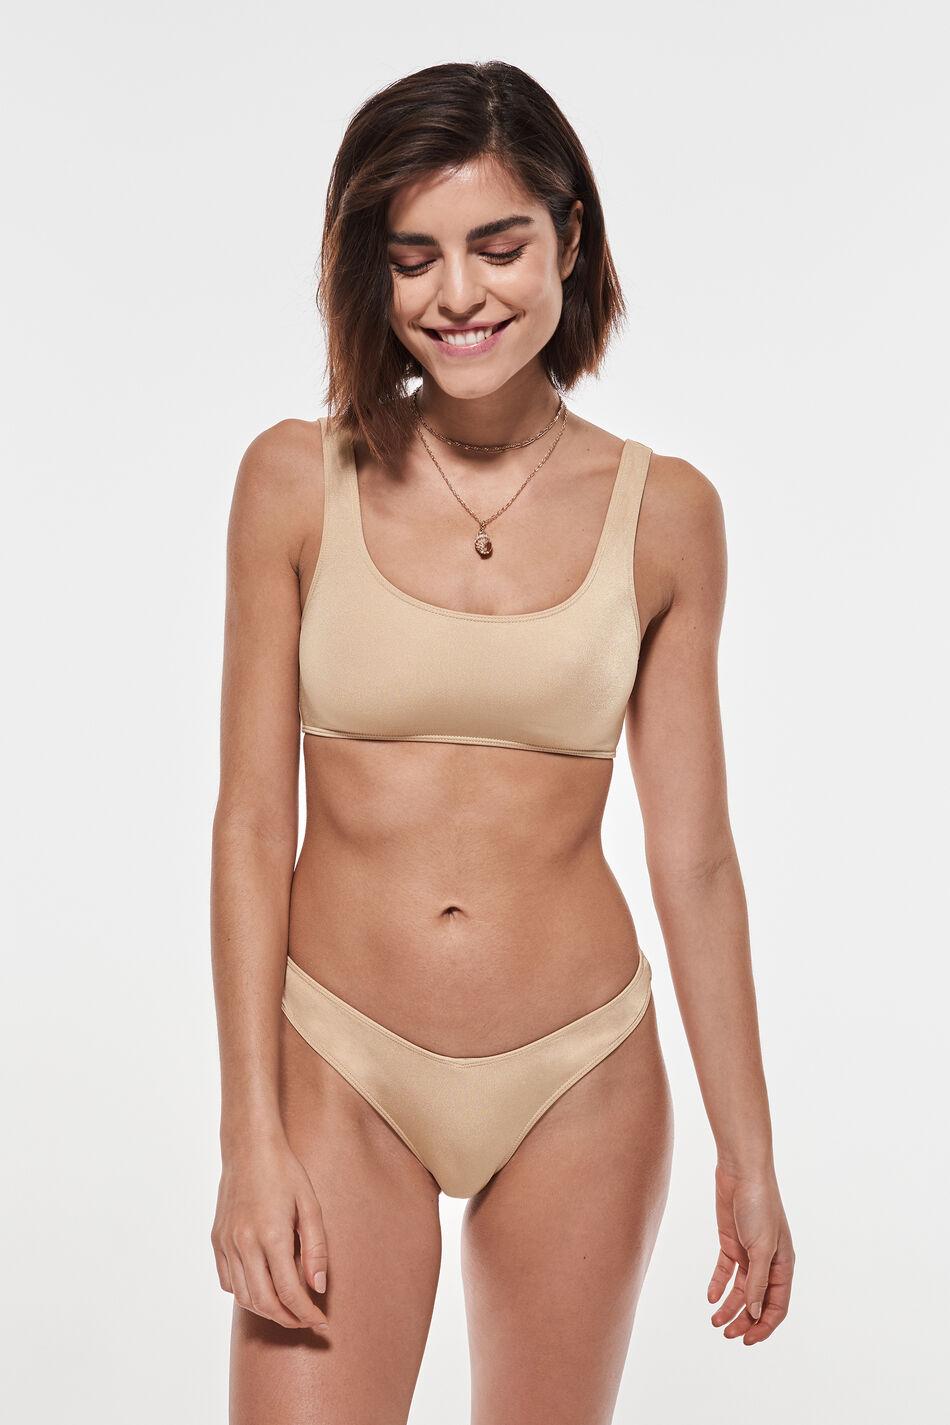 Gina Tricot Kelly bikini top